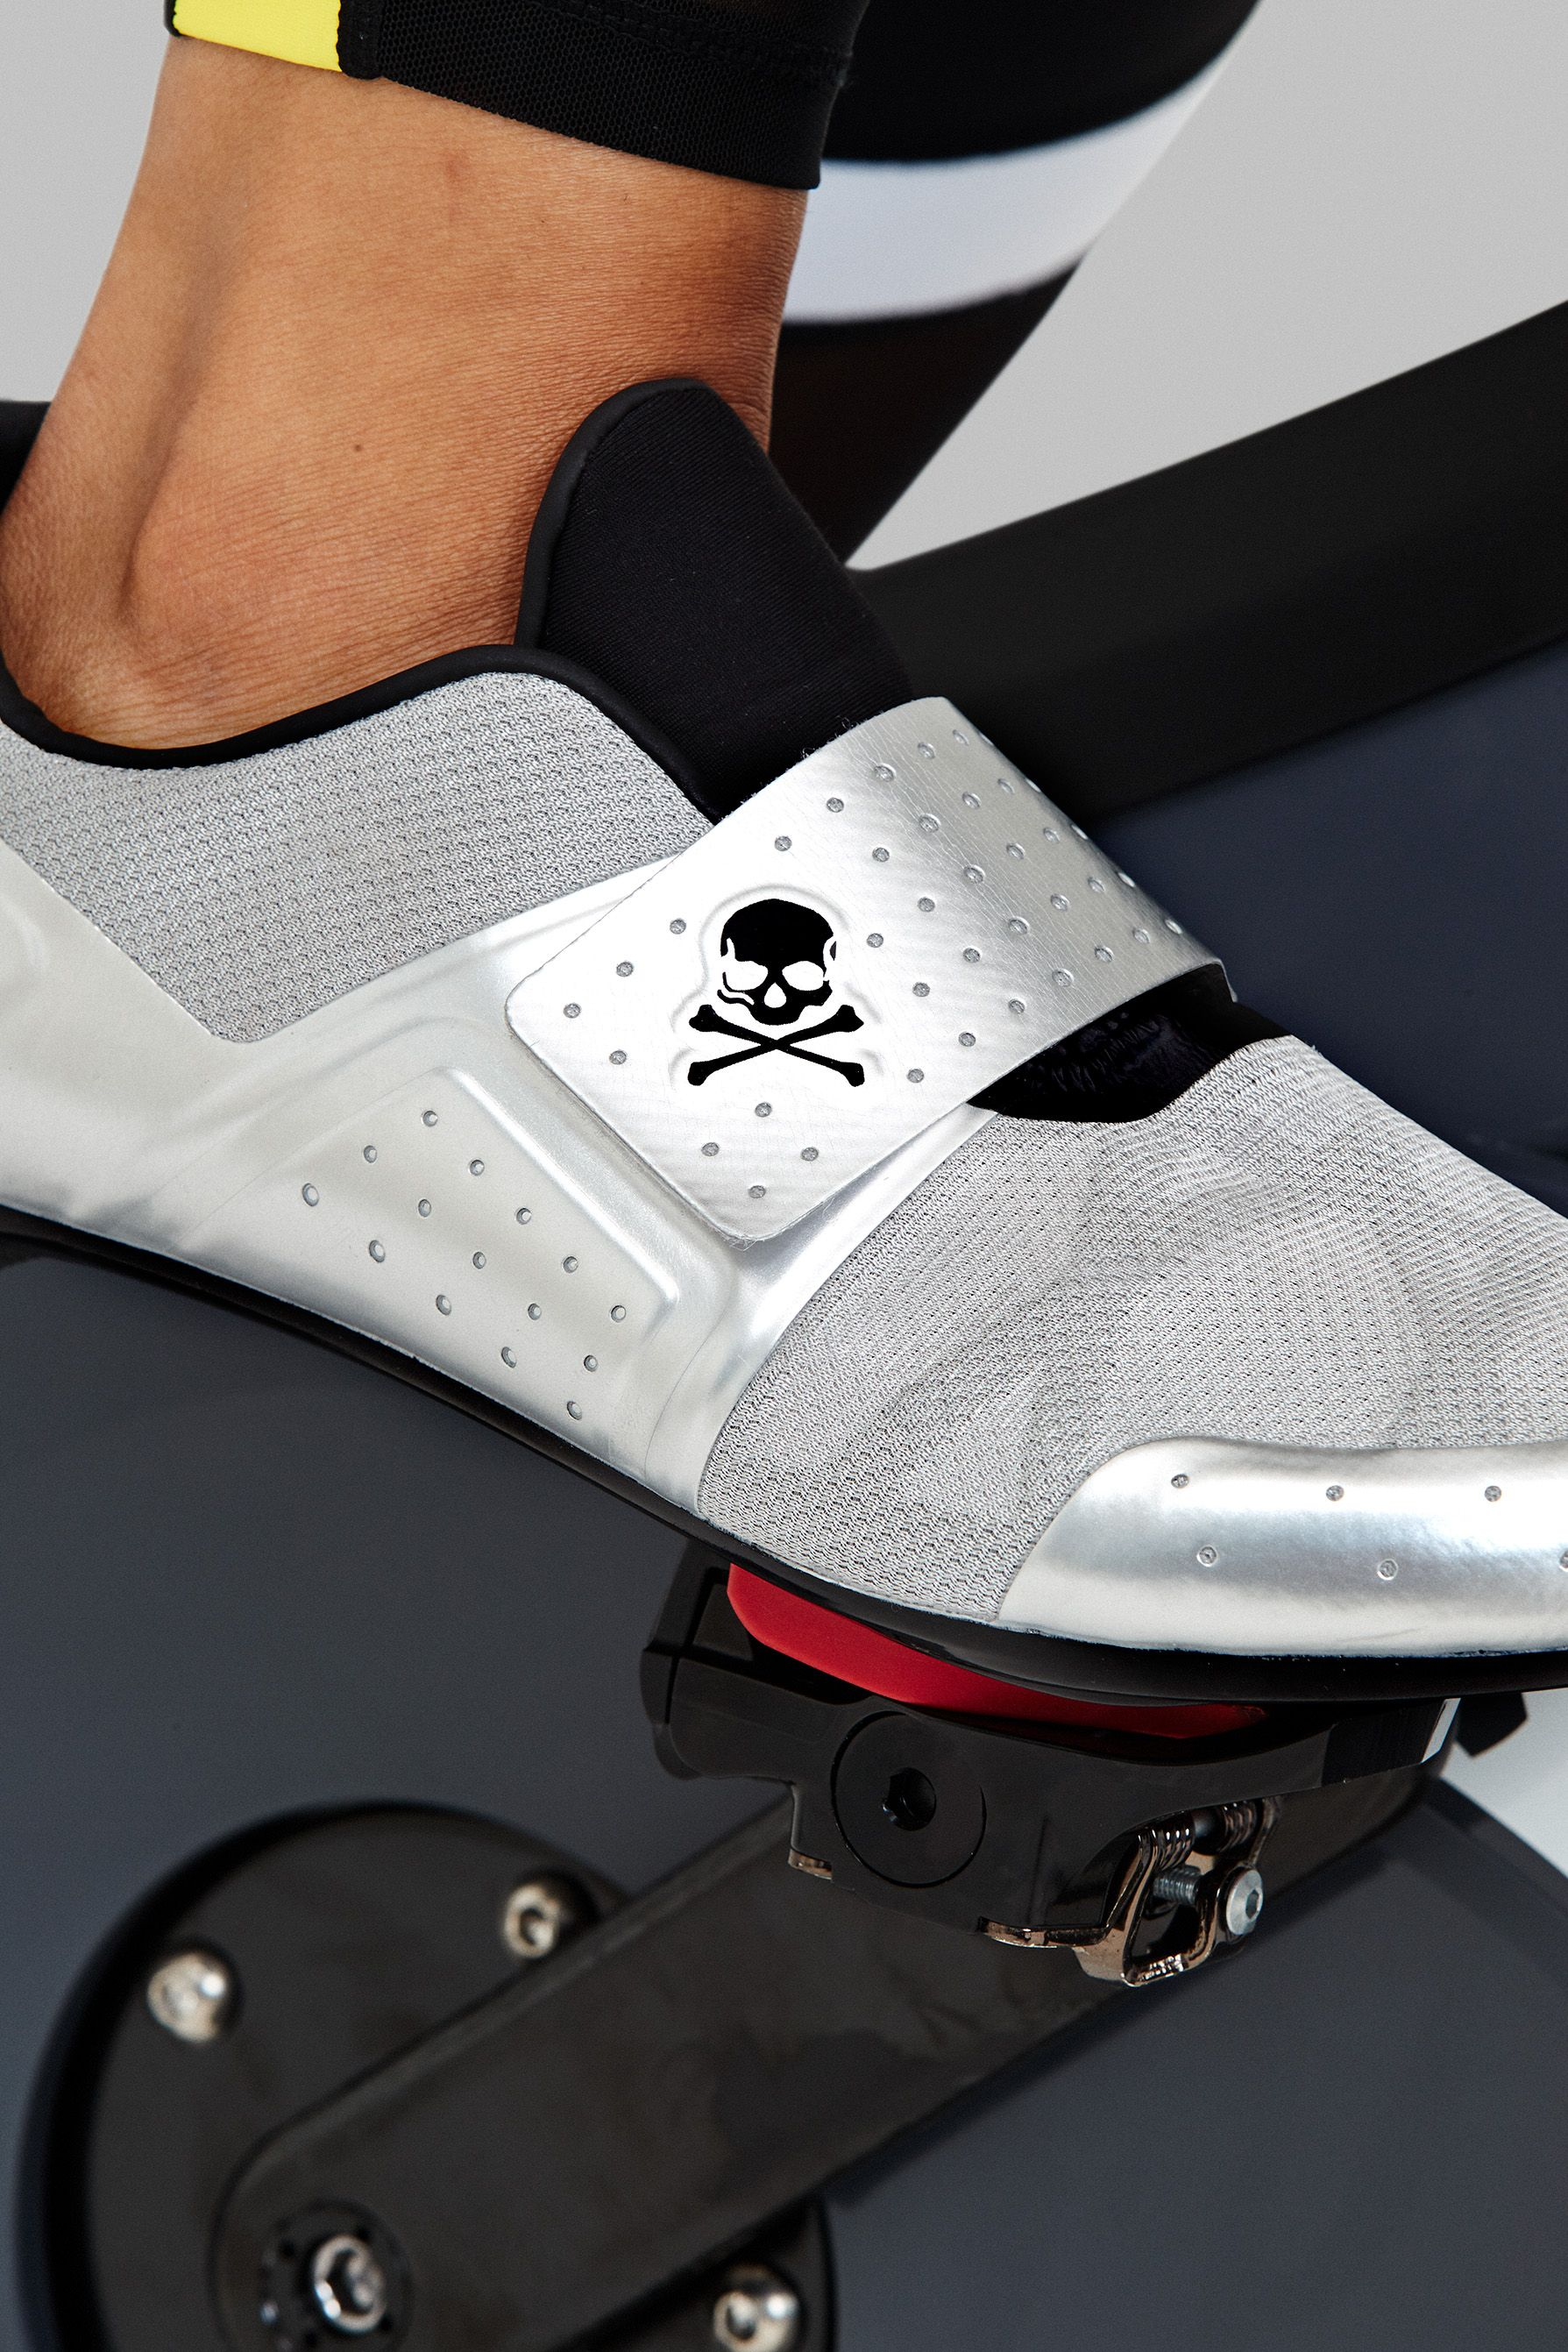 e9d5ab29f11 Silver Legend Cycling Shoe - SoulCycle Shop